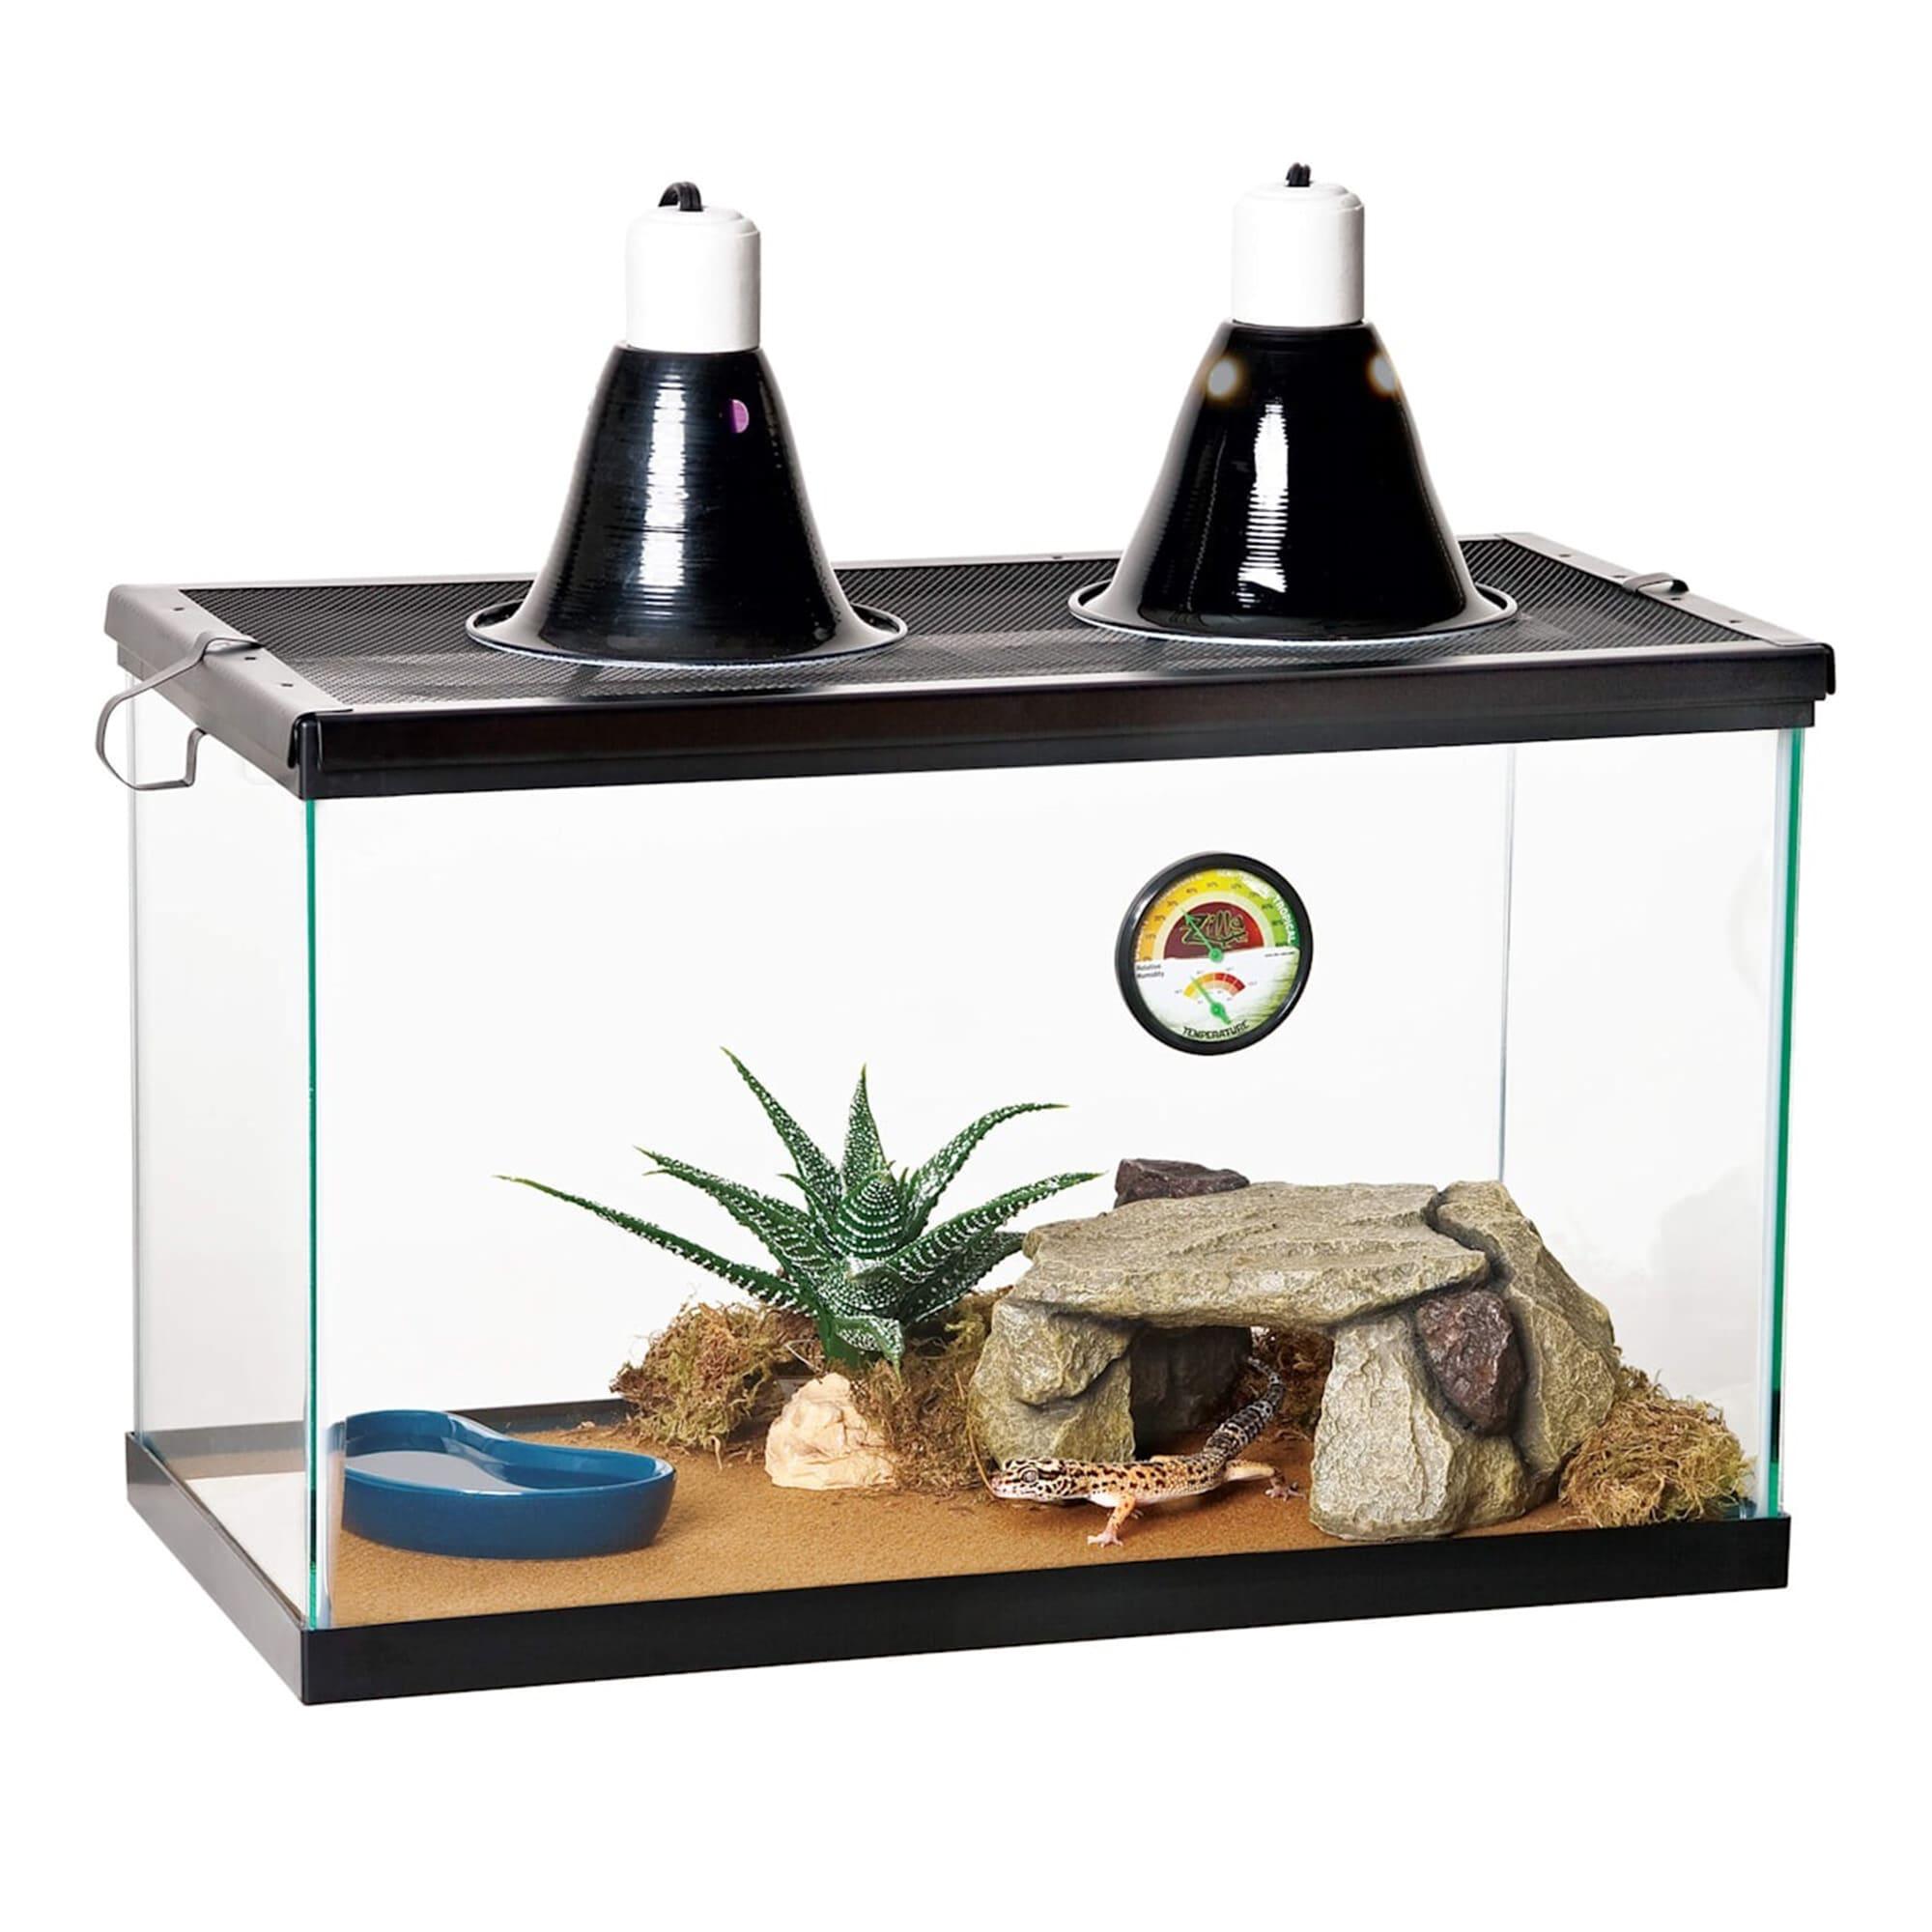 Gl Aquarium Tank 10 Gallon